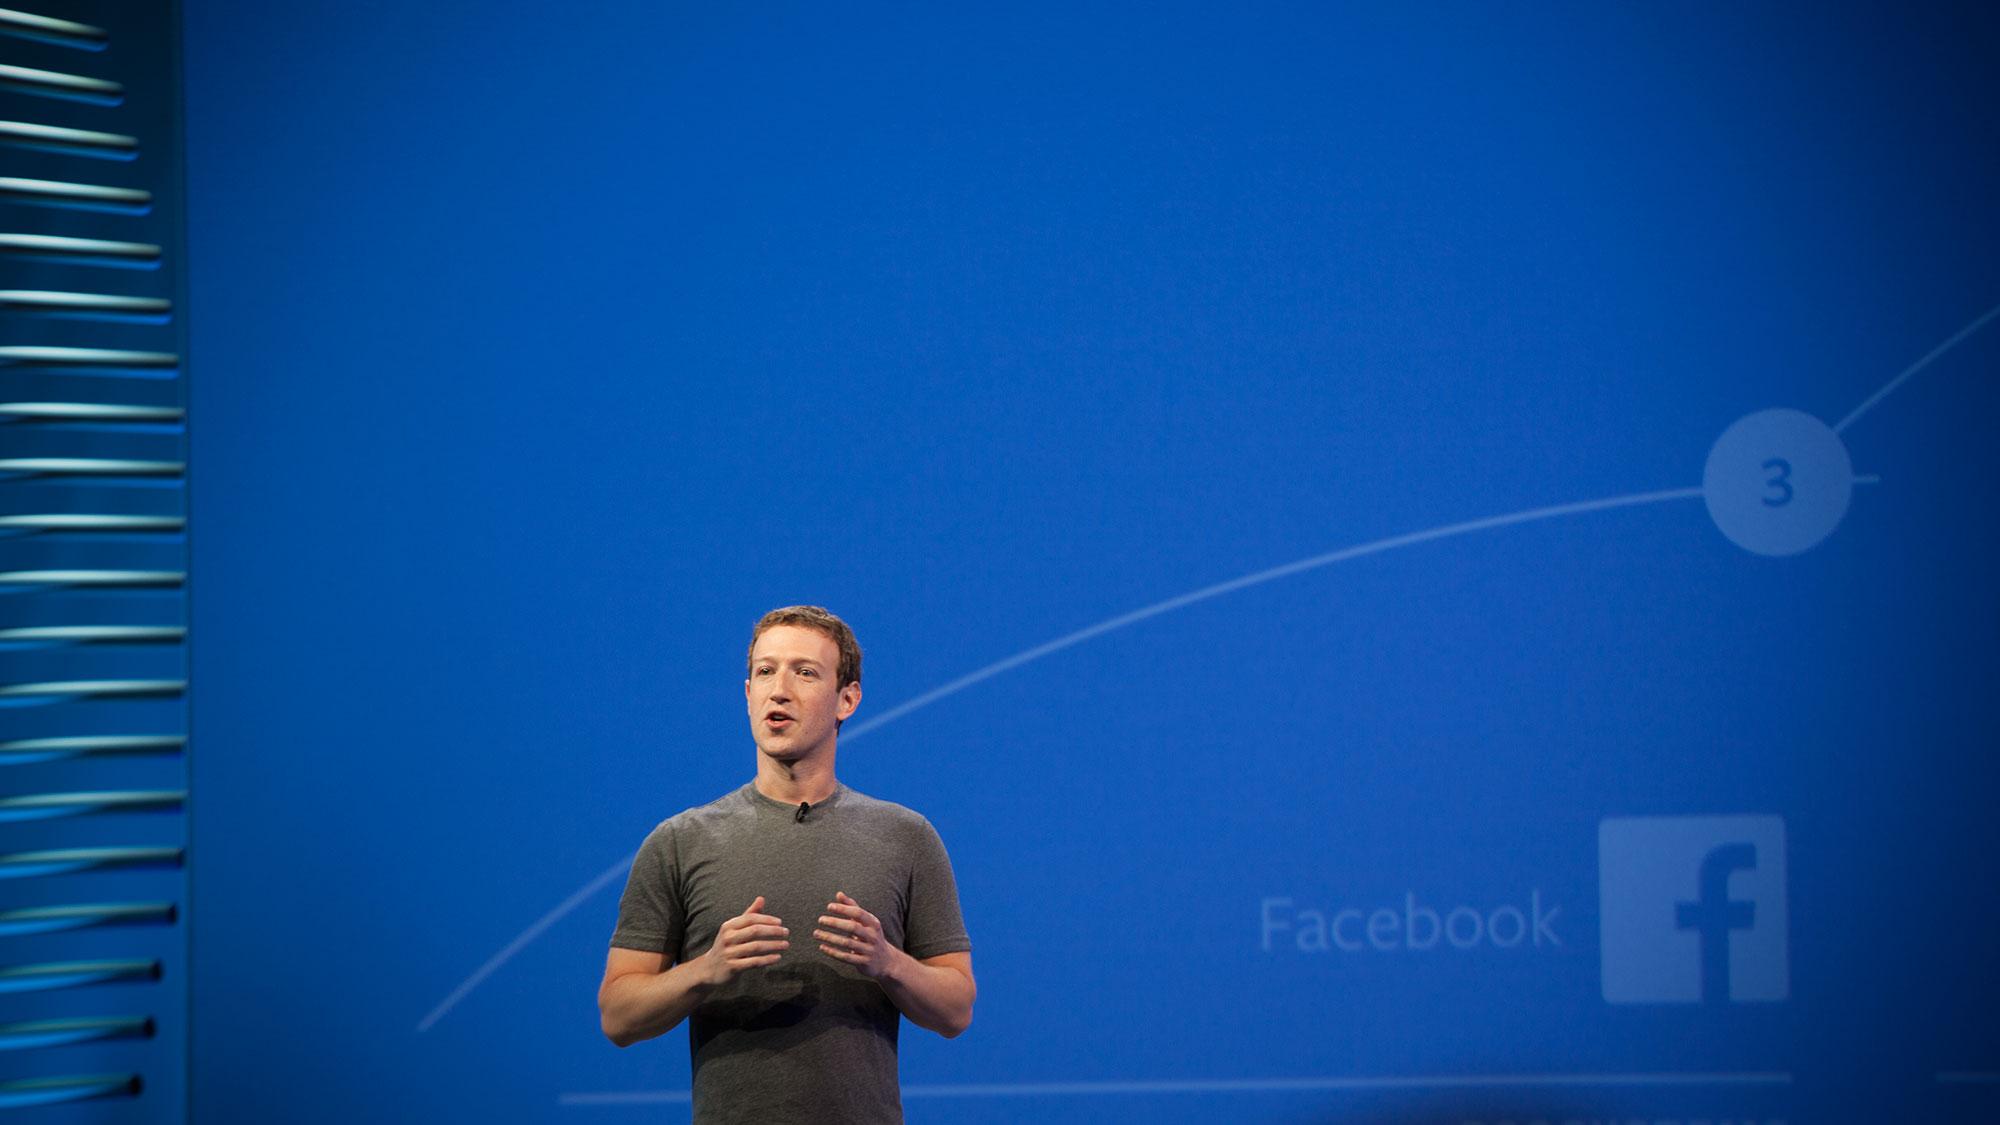 facebook ceo mark zuckerberg at facebook's developer conference f8 in san francisco april 12